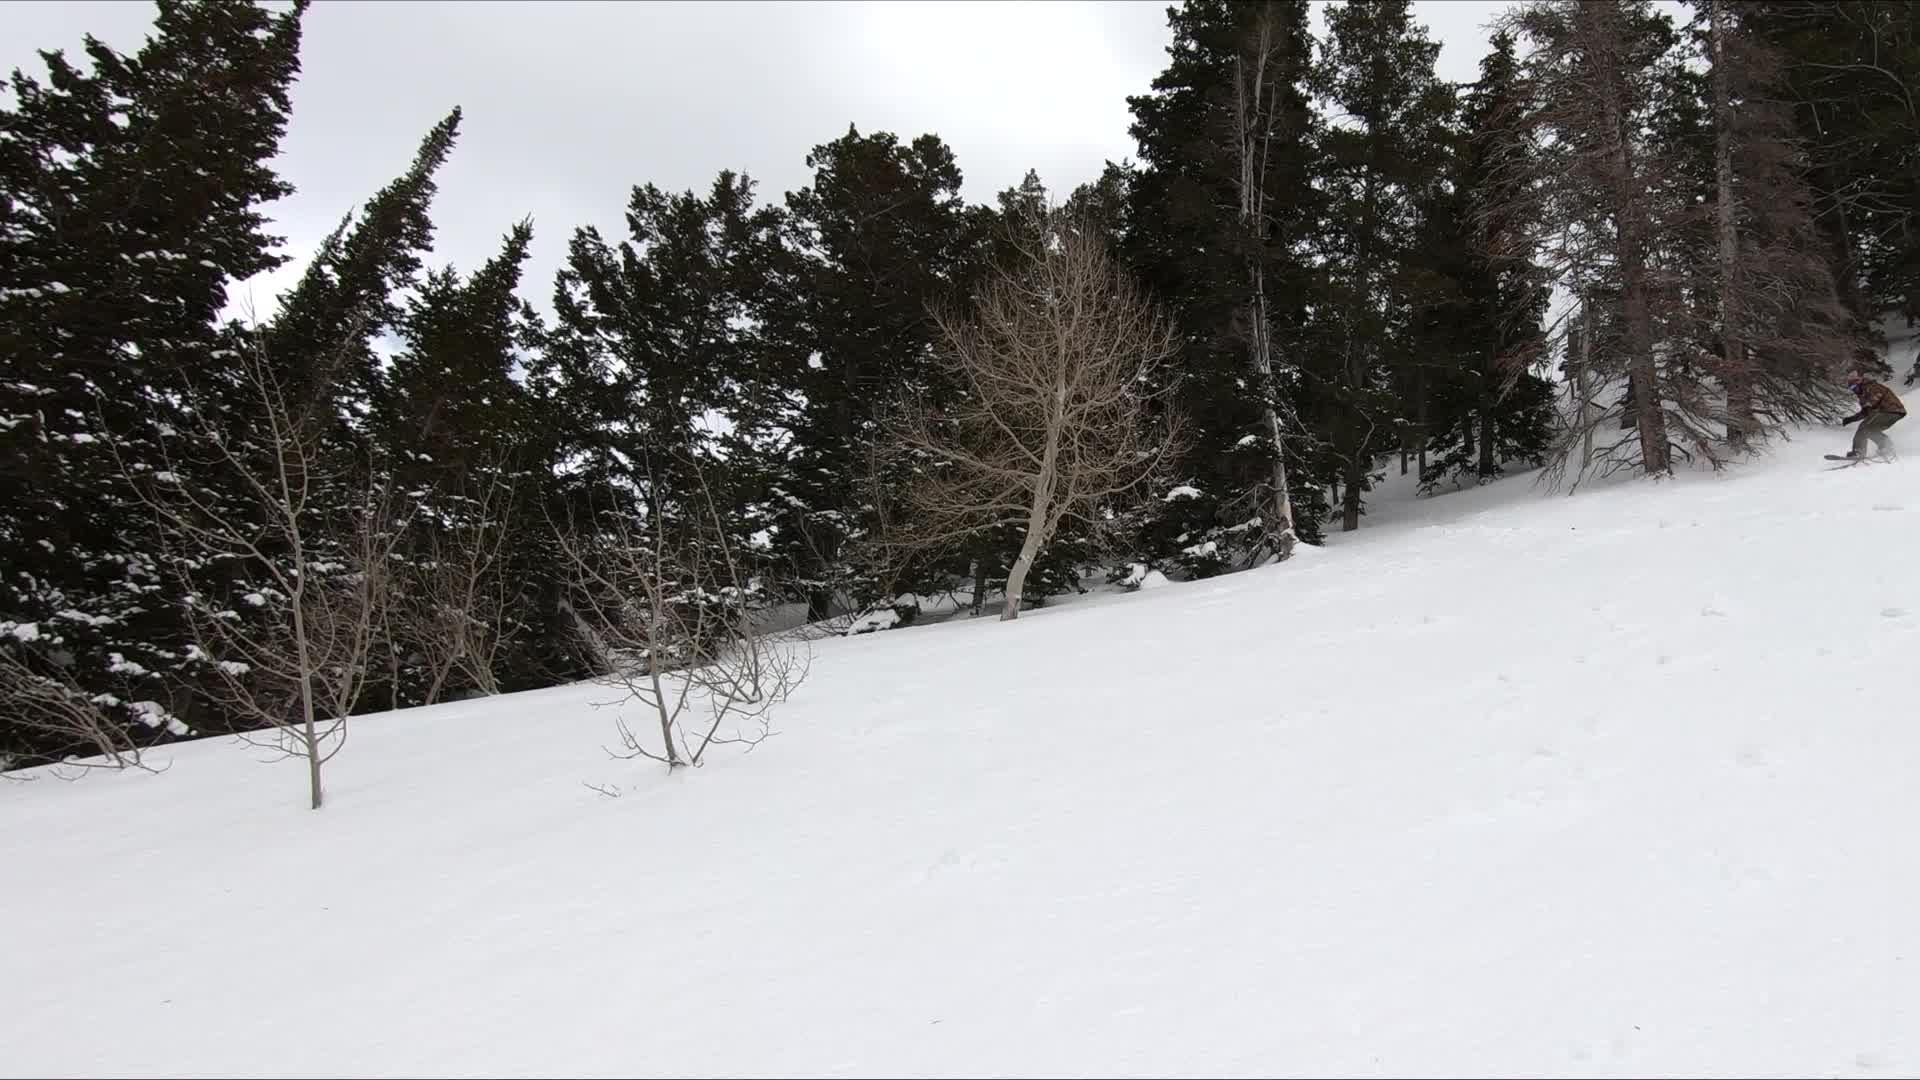 snowboard, snowboarding, sports,  GIFs